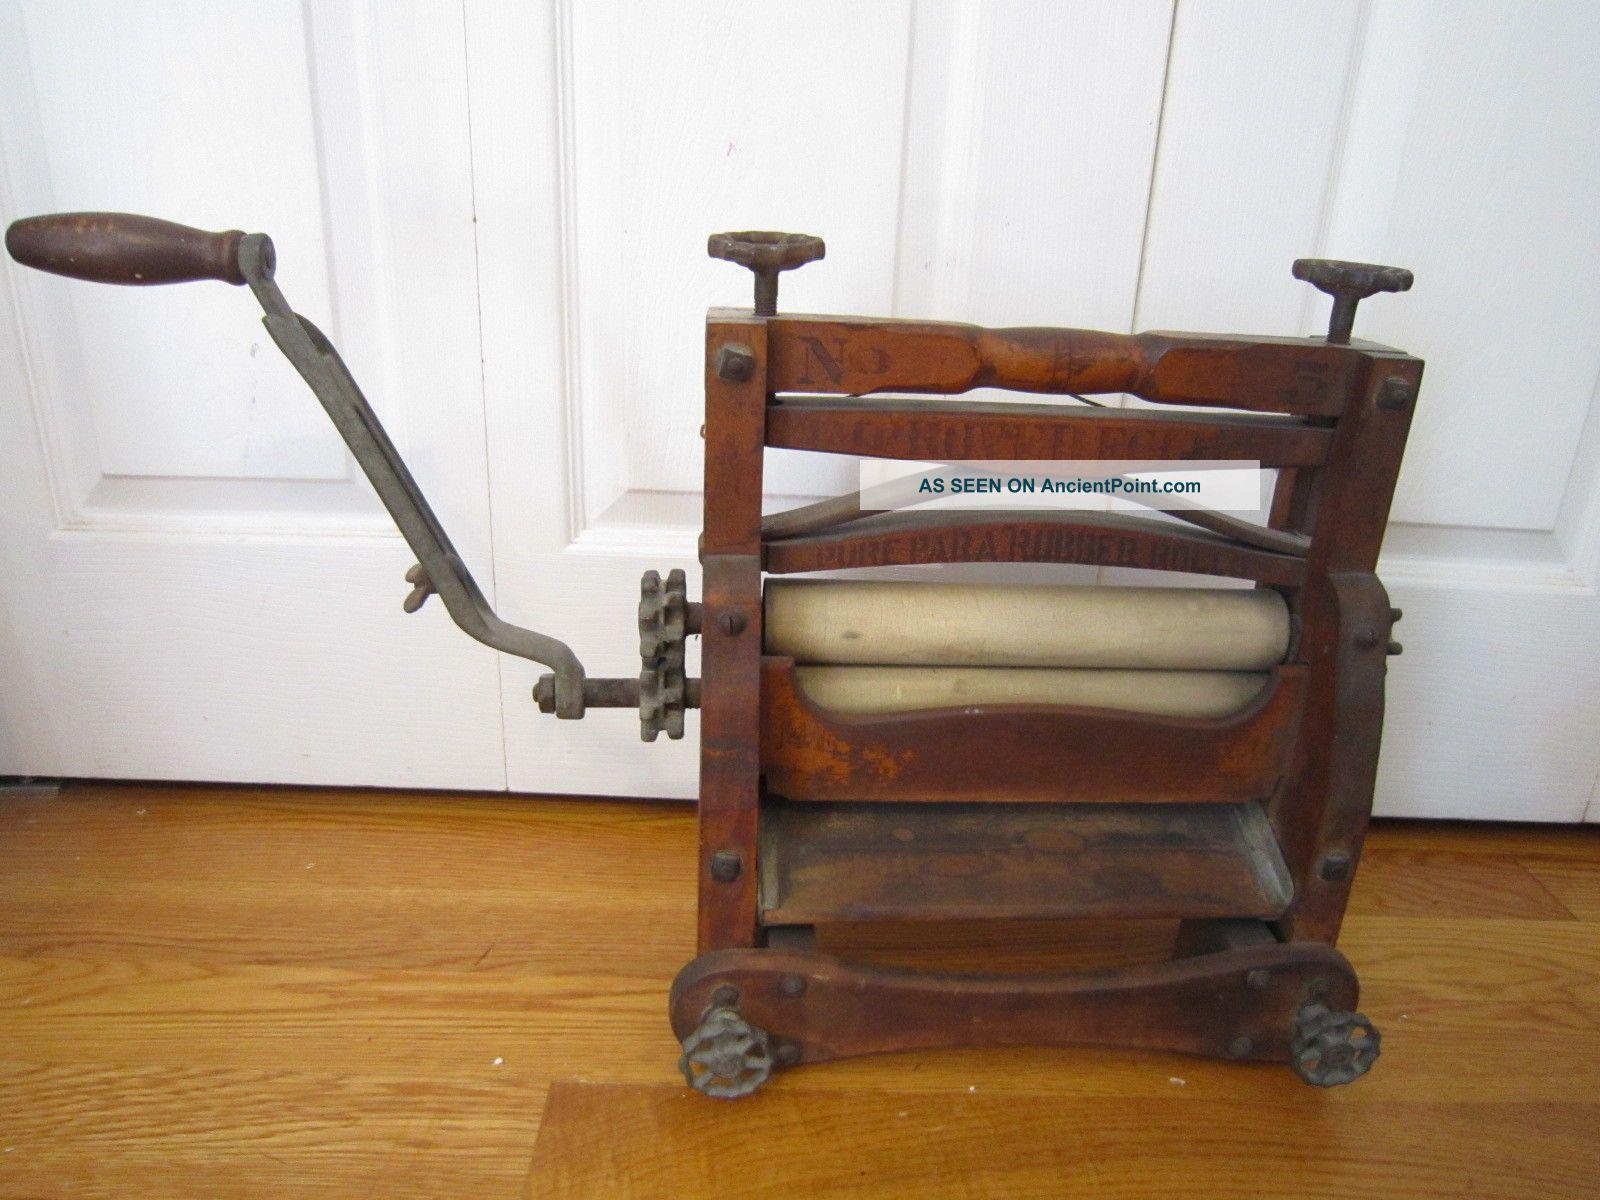 Antique Wood & Iron Improved Eclipse Washer Wringer,  Steampunk,  Advertising 1888 Clothing Wringers photo